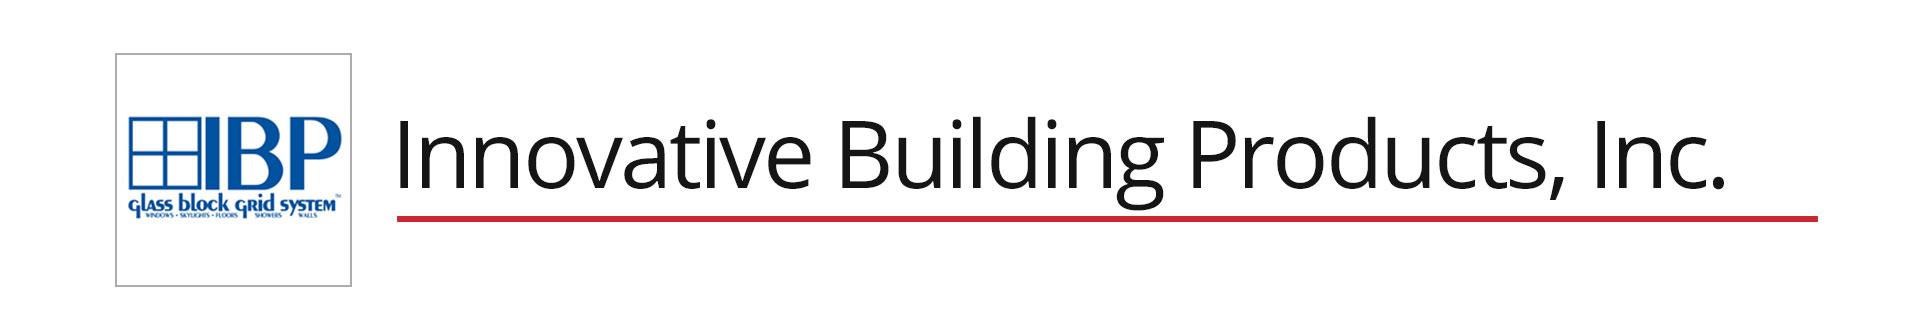 Innovative-Building-Products,-Inc._CADBlock-Header.jpg